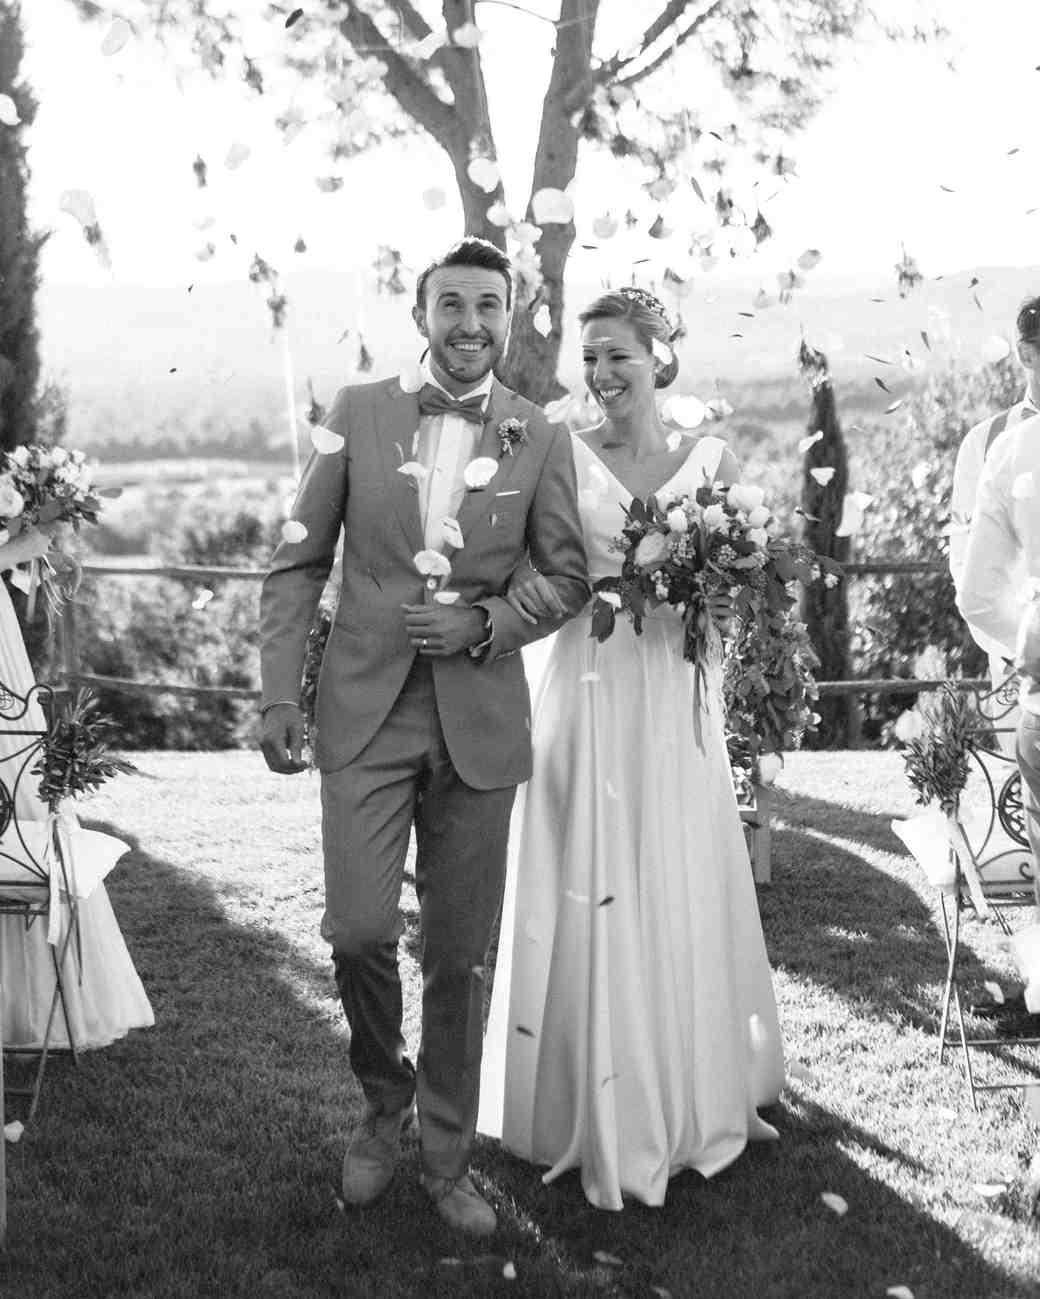 regina-jack-wedding-recessional-35-s111820-0215.jpg